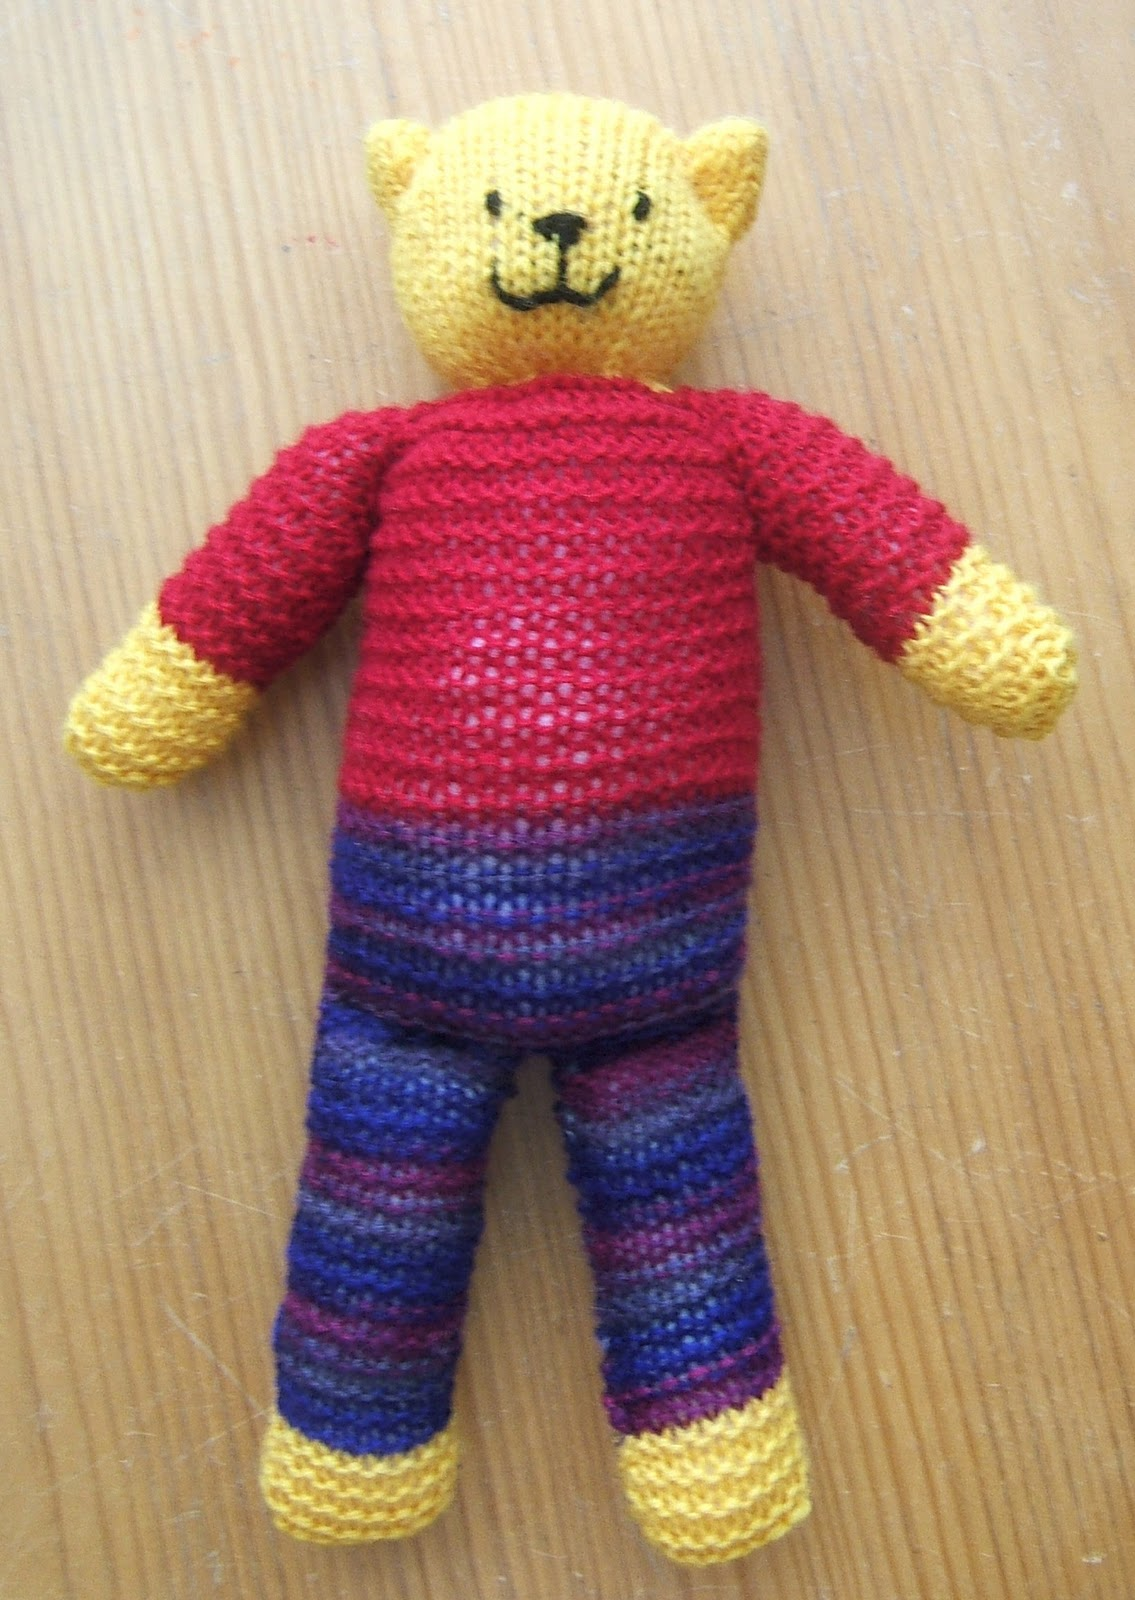 aussie knitting threads: The Ready Teddy